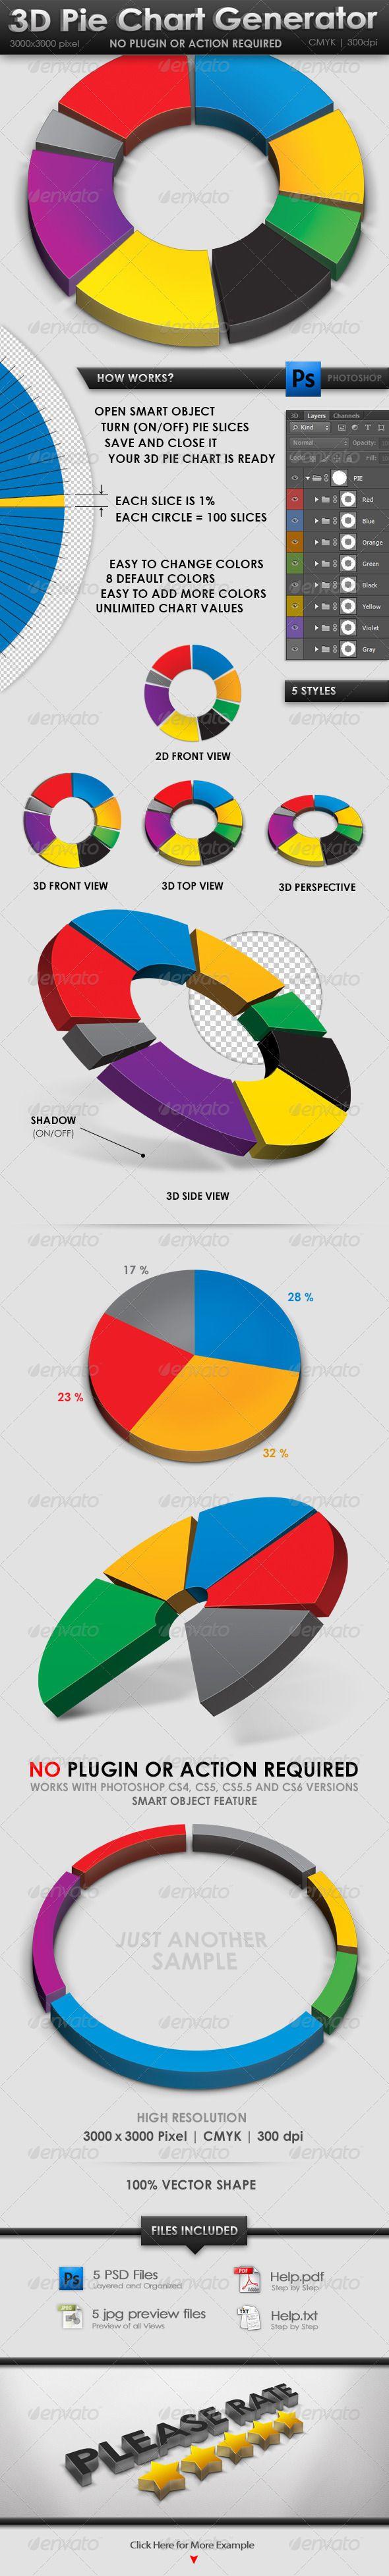 25+ best ideas about Pie chart generator on Pinterest   Ui design ...